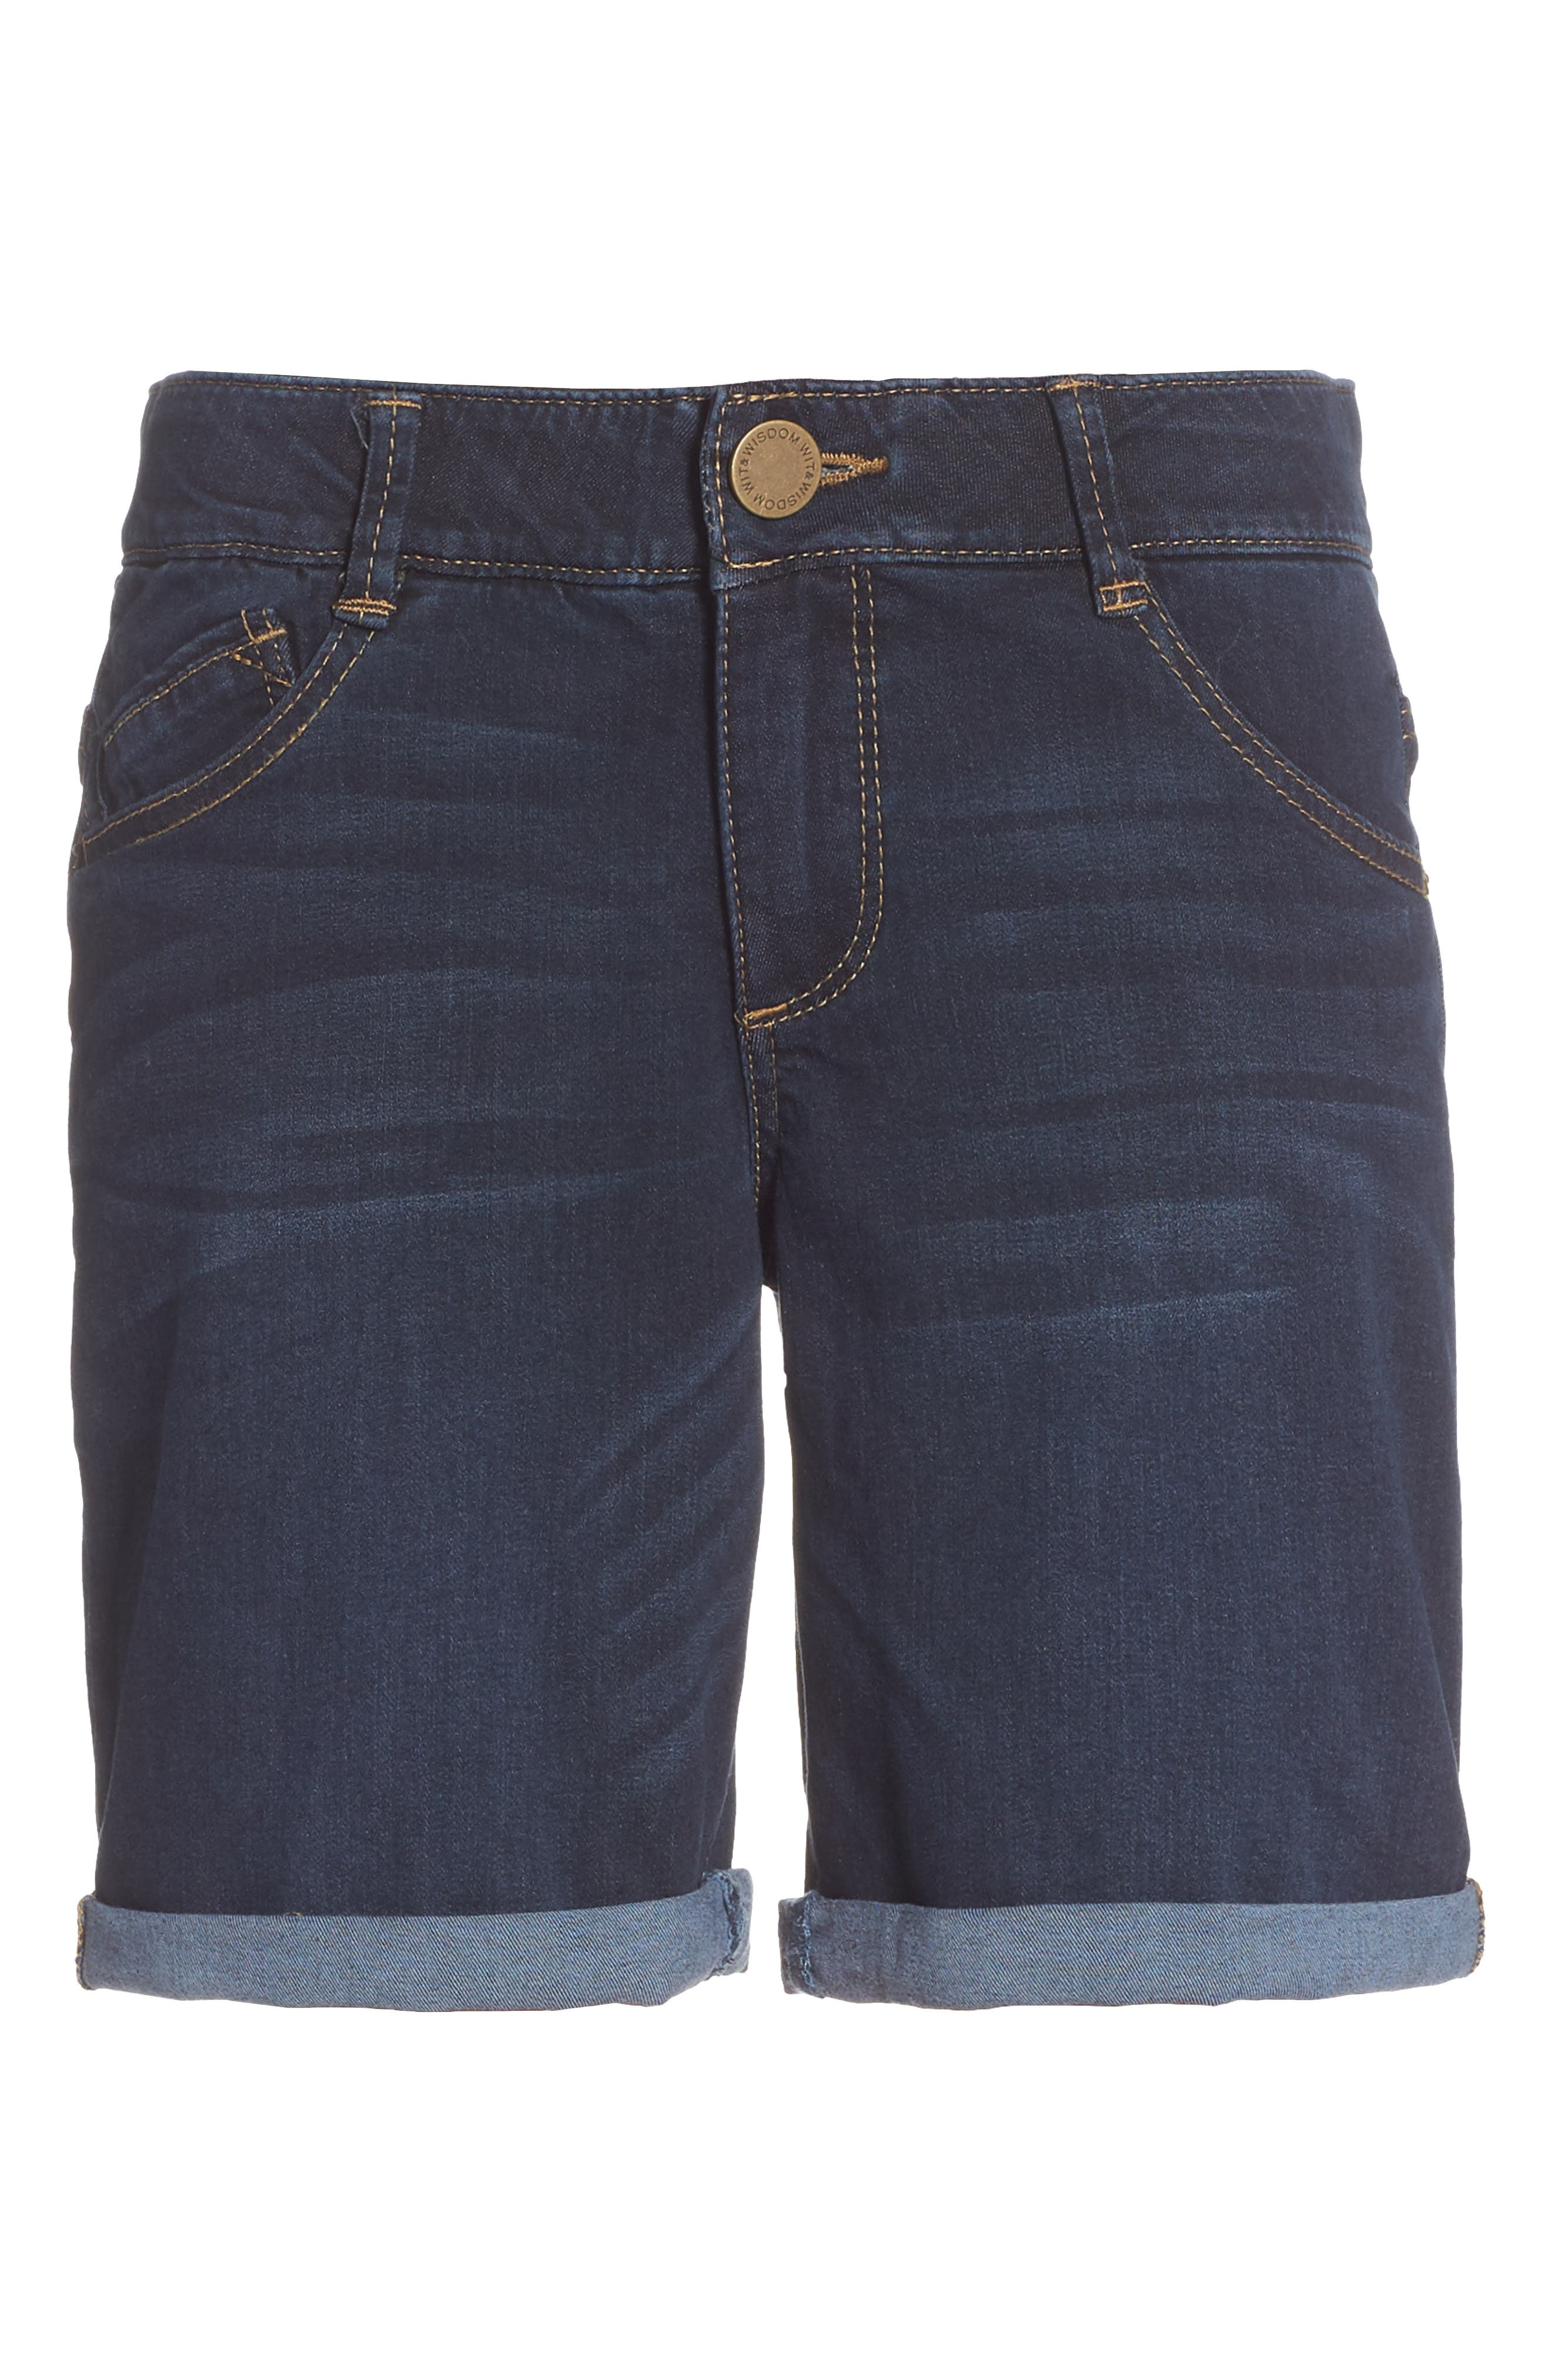 Ab-solution Cuffed Denim Shorts,                             Alternate thumbnail 6, color,                             402